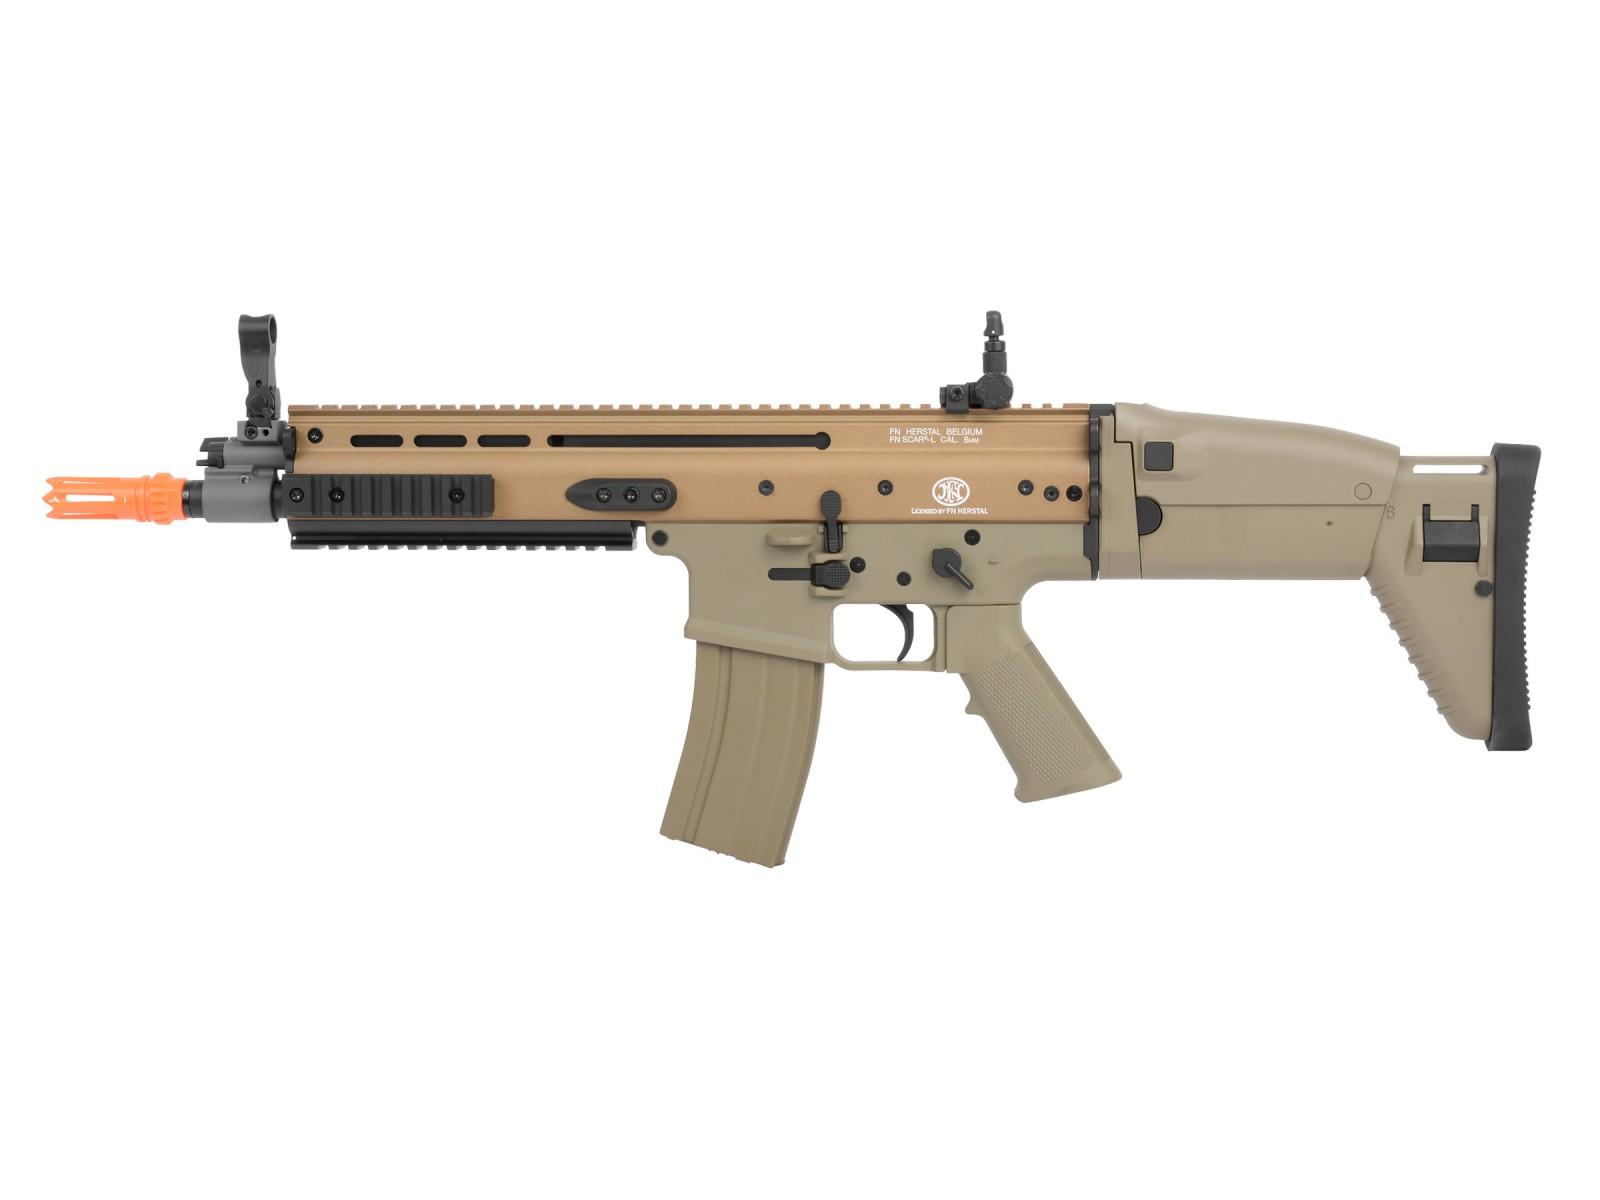 FN_SCARL_Metal_AEG_Airsoft_Rifle_Tan_6mm